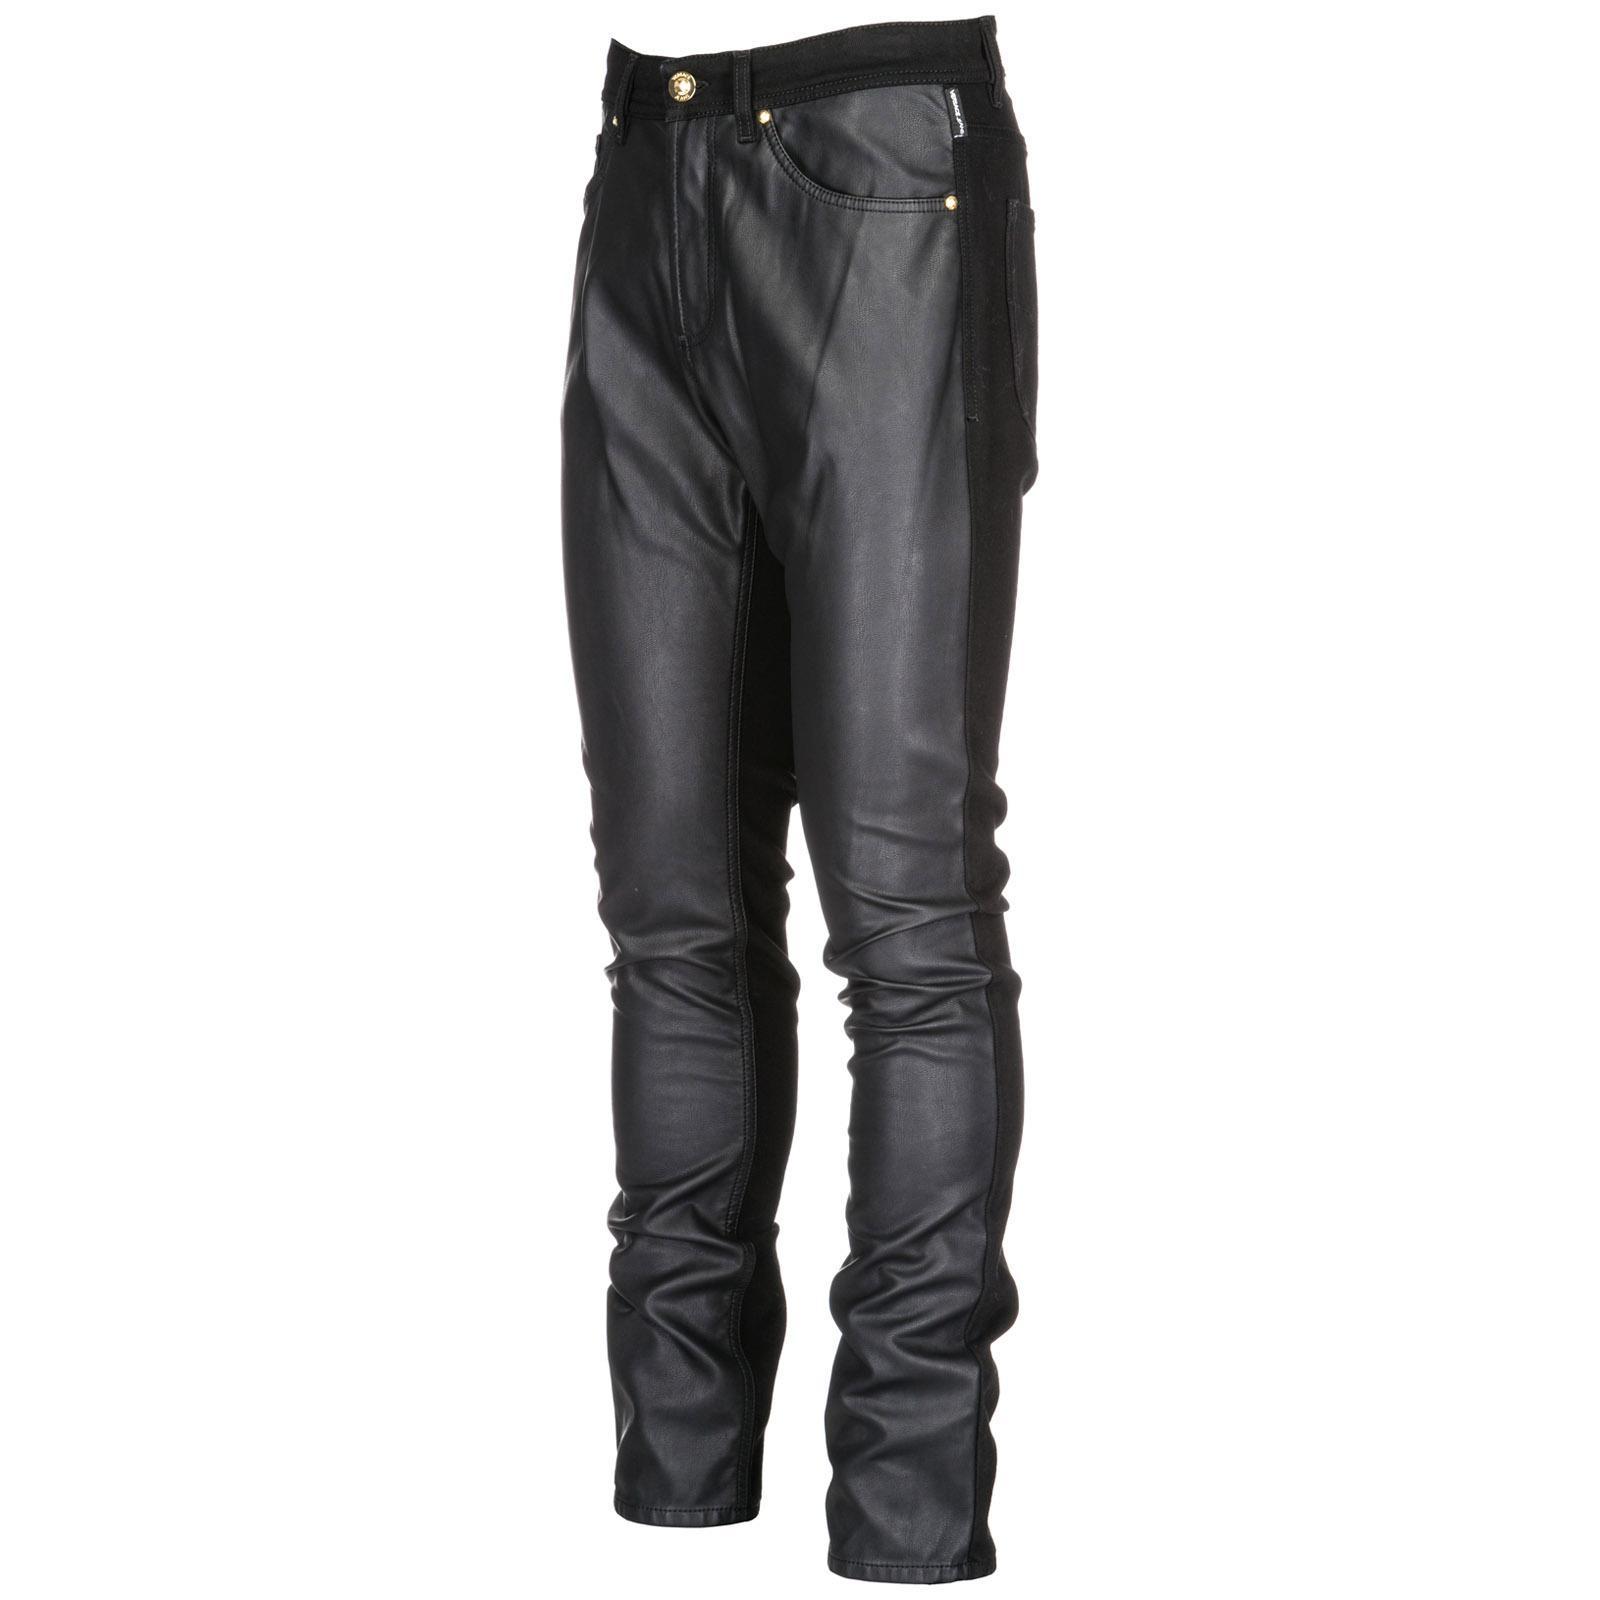 Versace Jeans Couture Men's Jeans Denim Slim in Nero (Black) for Men